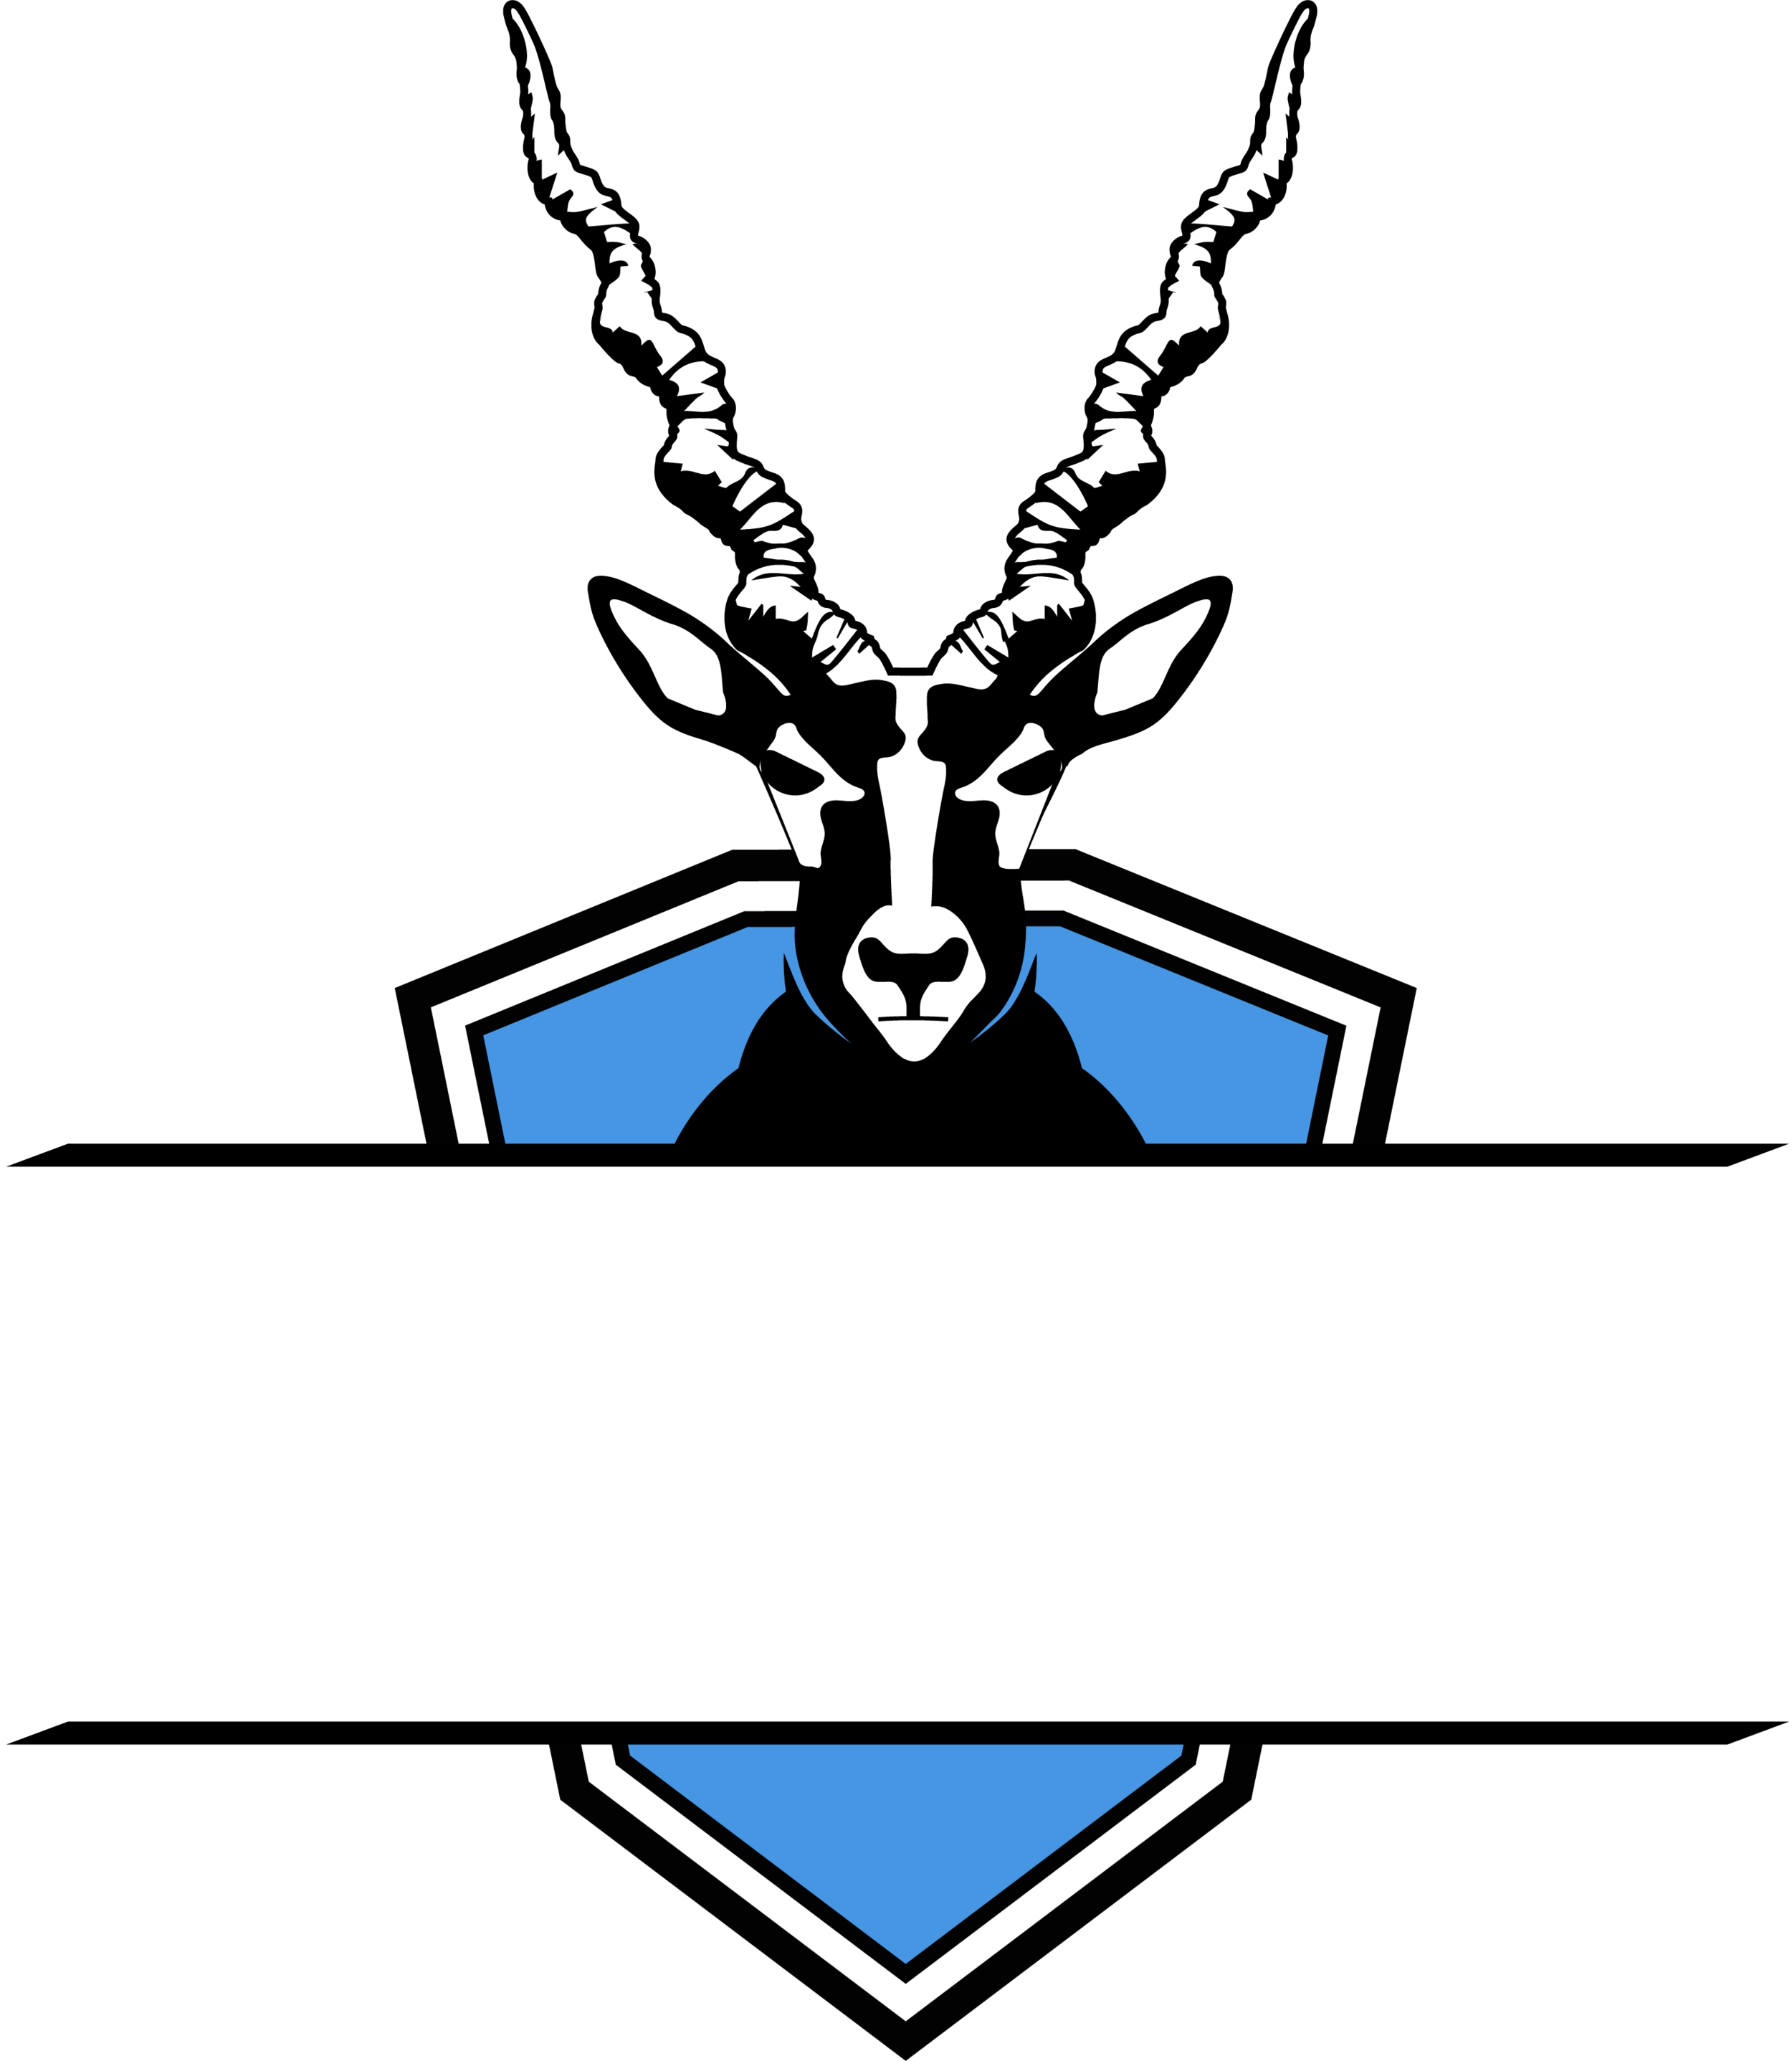 CrossfitBlackbuck-Final-16.png